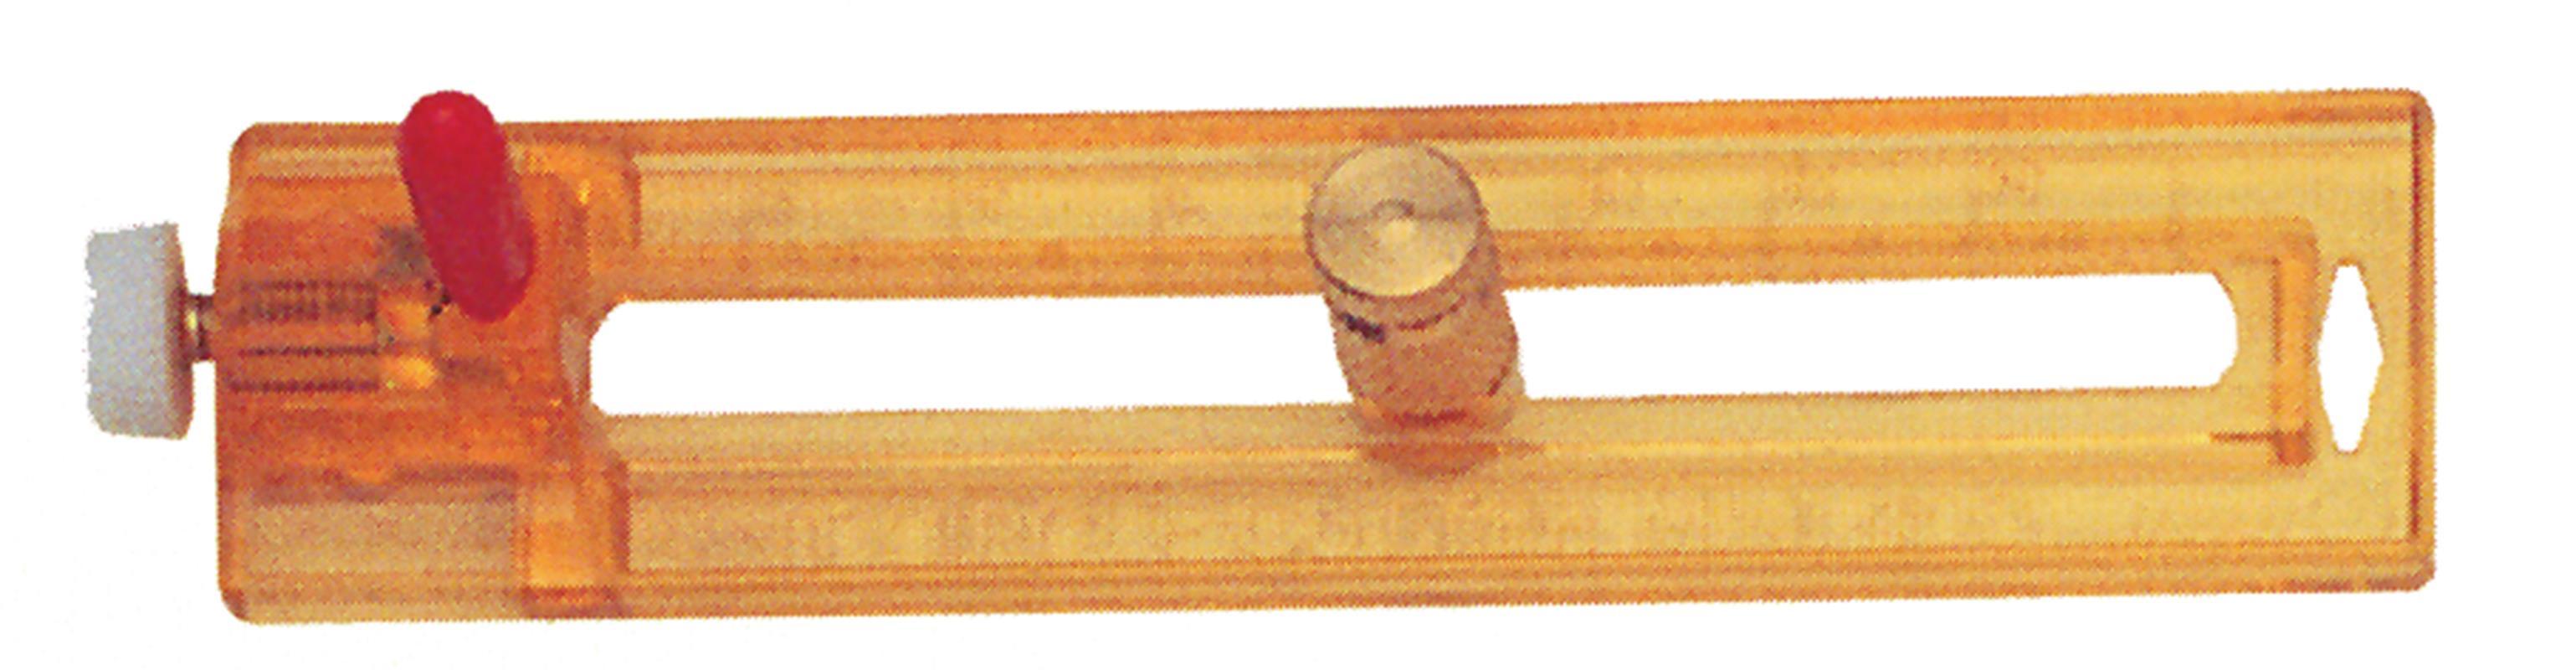 Next Μαχαίρι κοπής κύκλων 11358---17-2 σχολικά   χειροτεχνία   ψαλίδια   κοπίδια